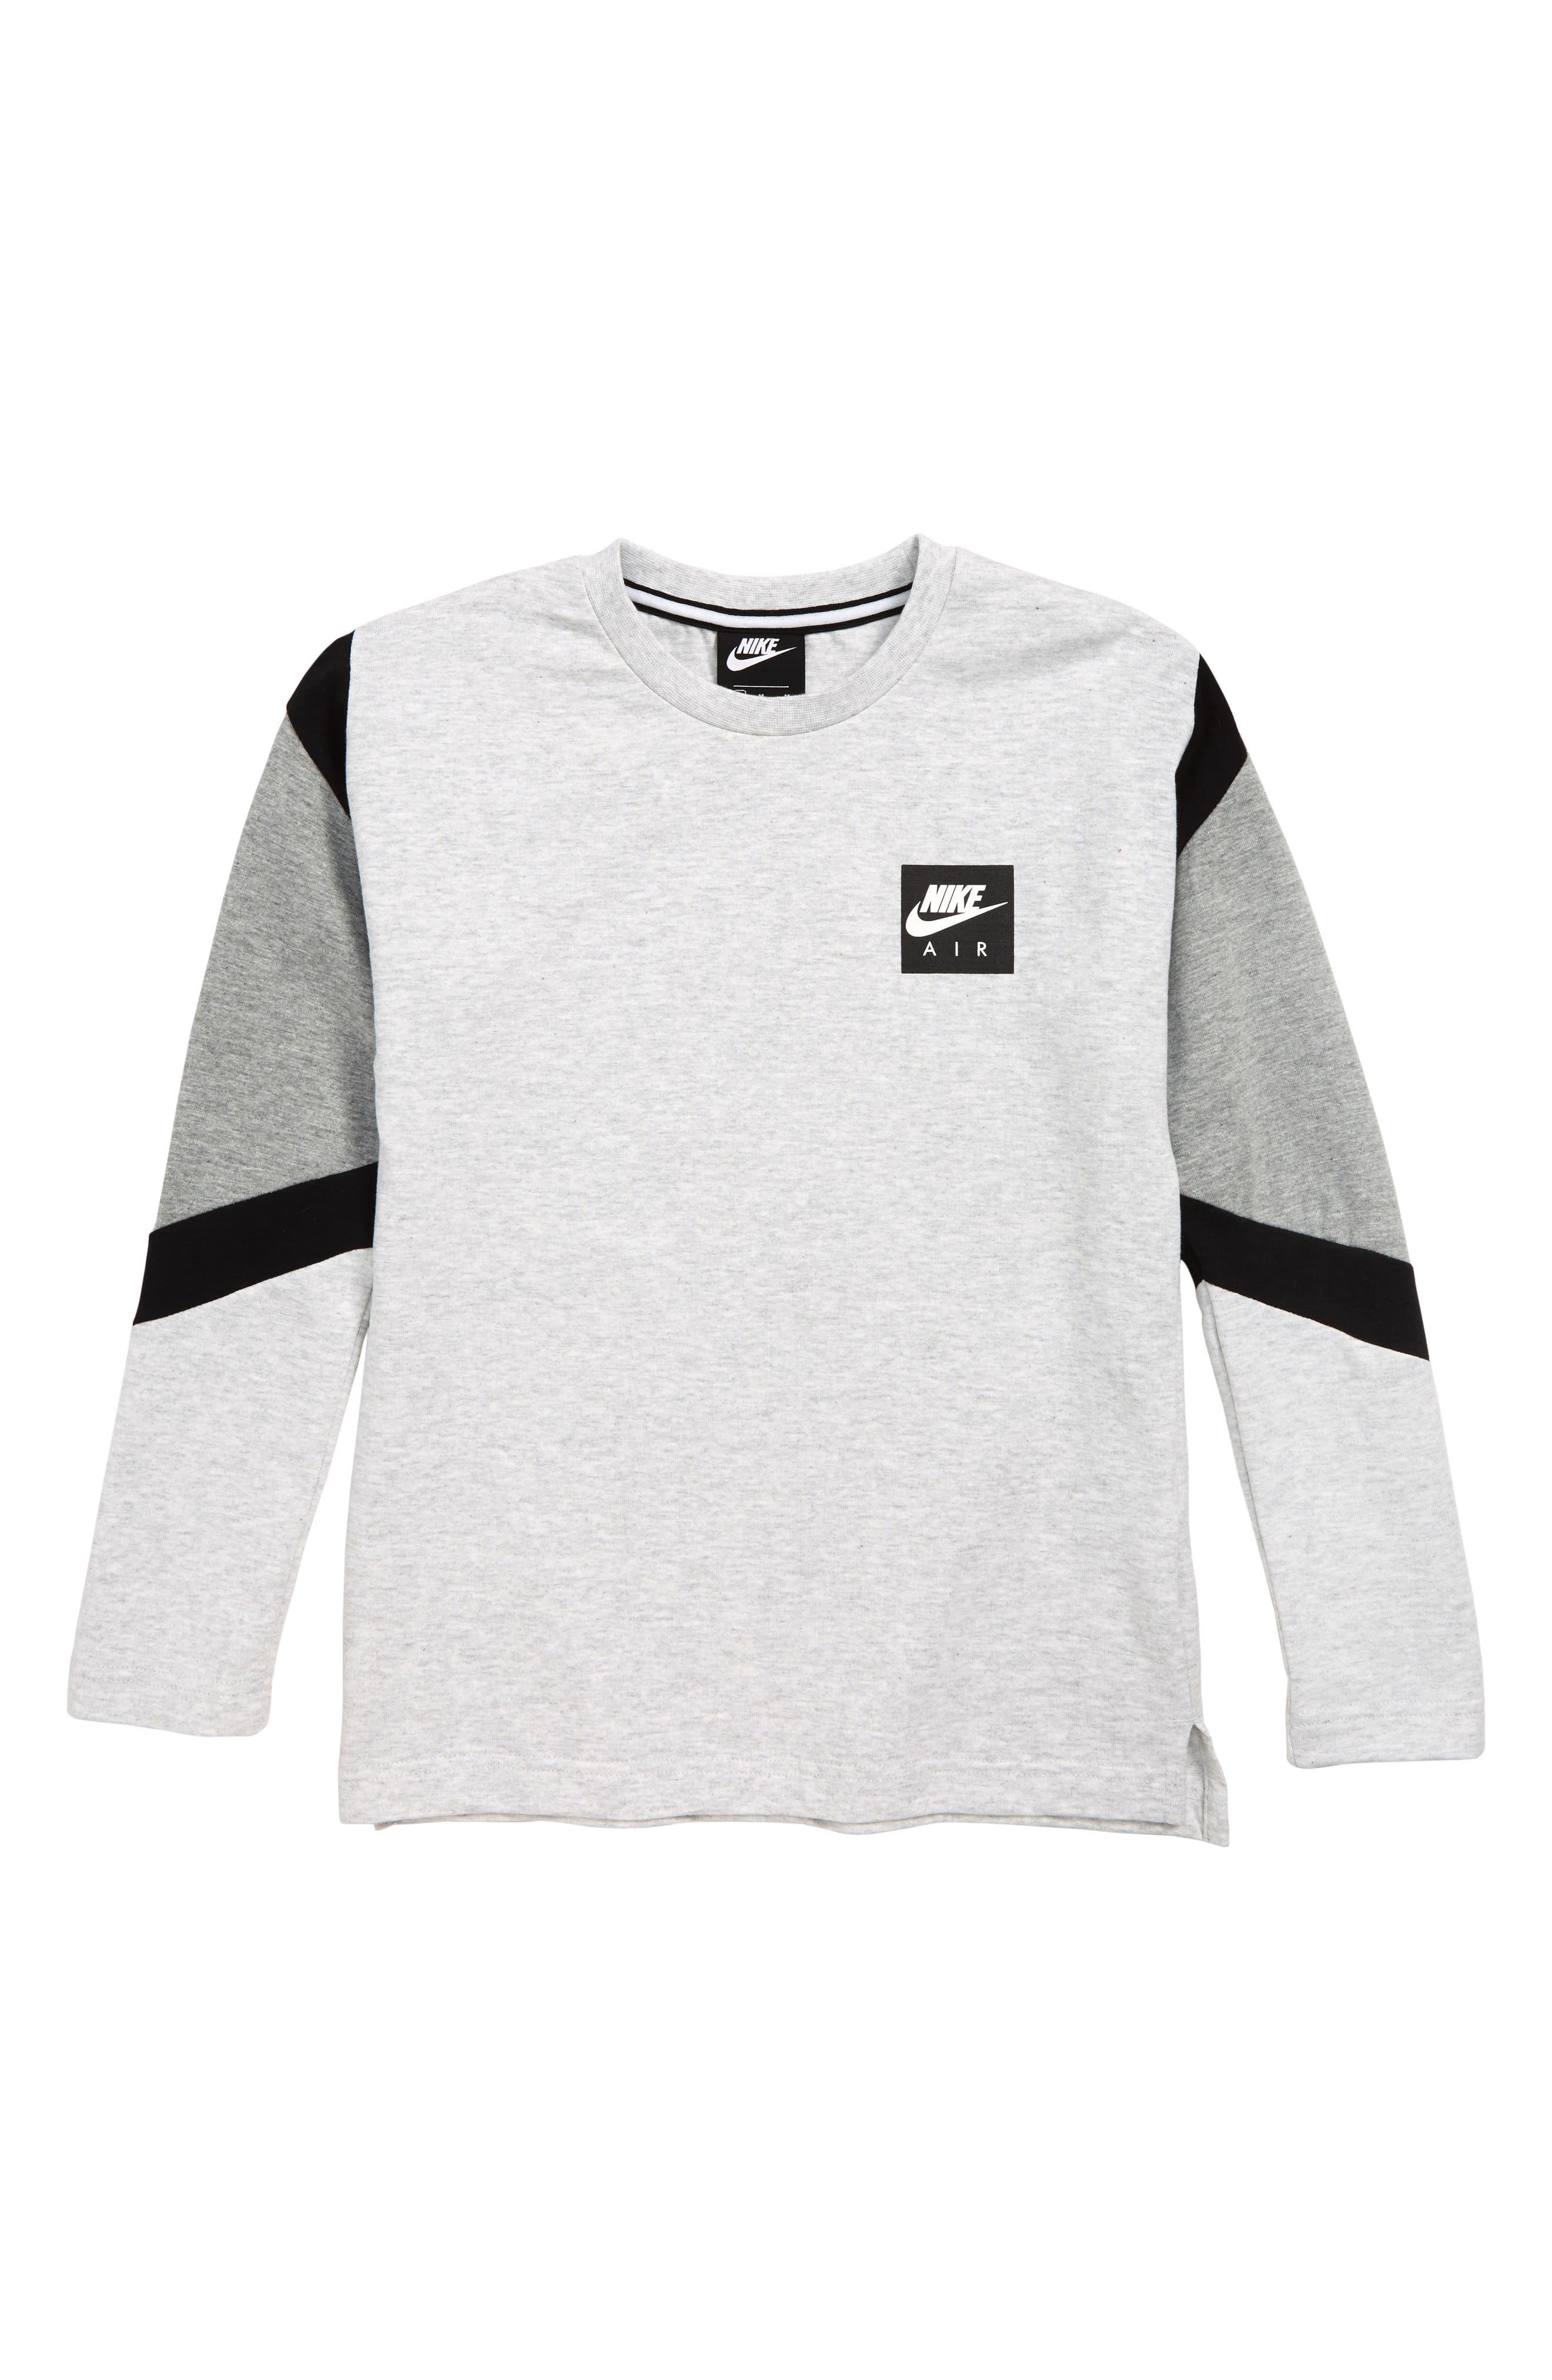 NIKE,                             Air Long Sleeve T-Shirt,                             Main thumbnail 1, color,                             BIRCH HEATHER